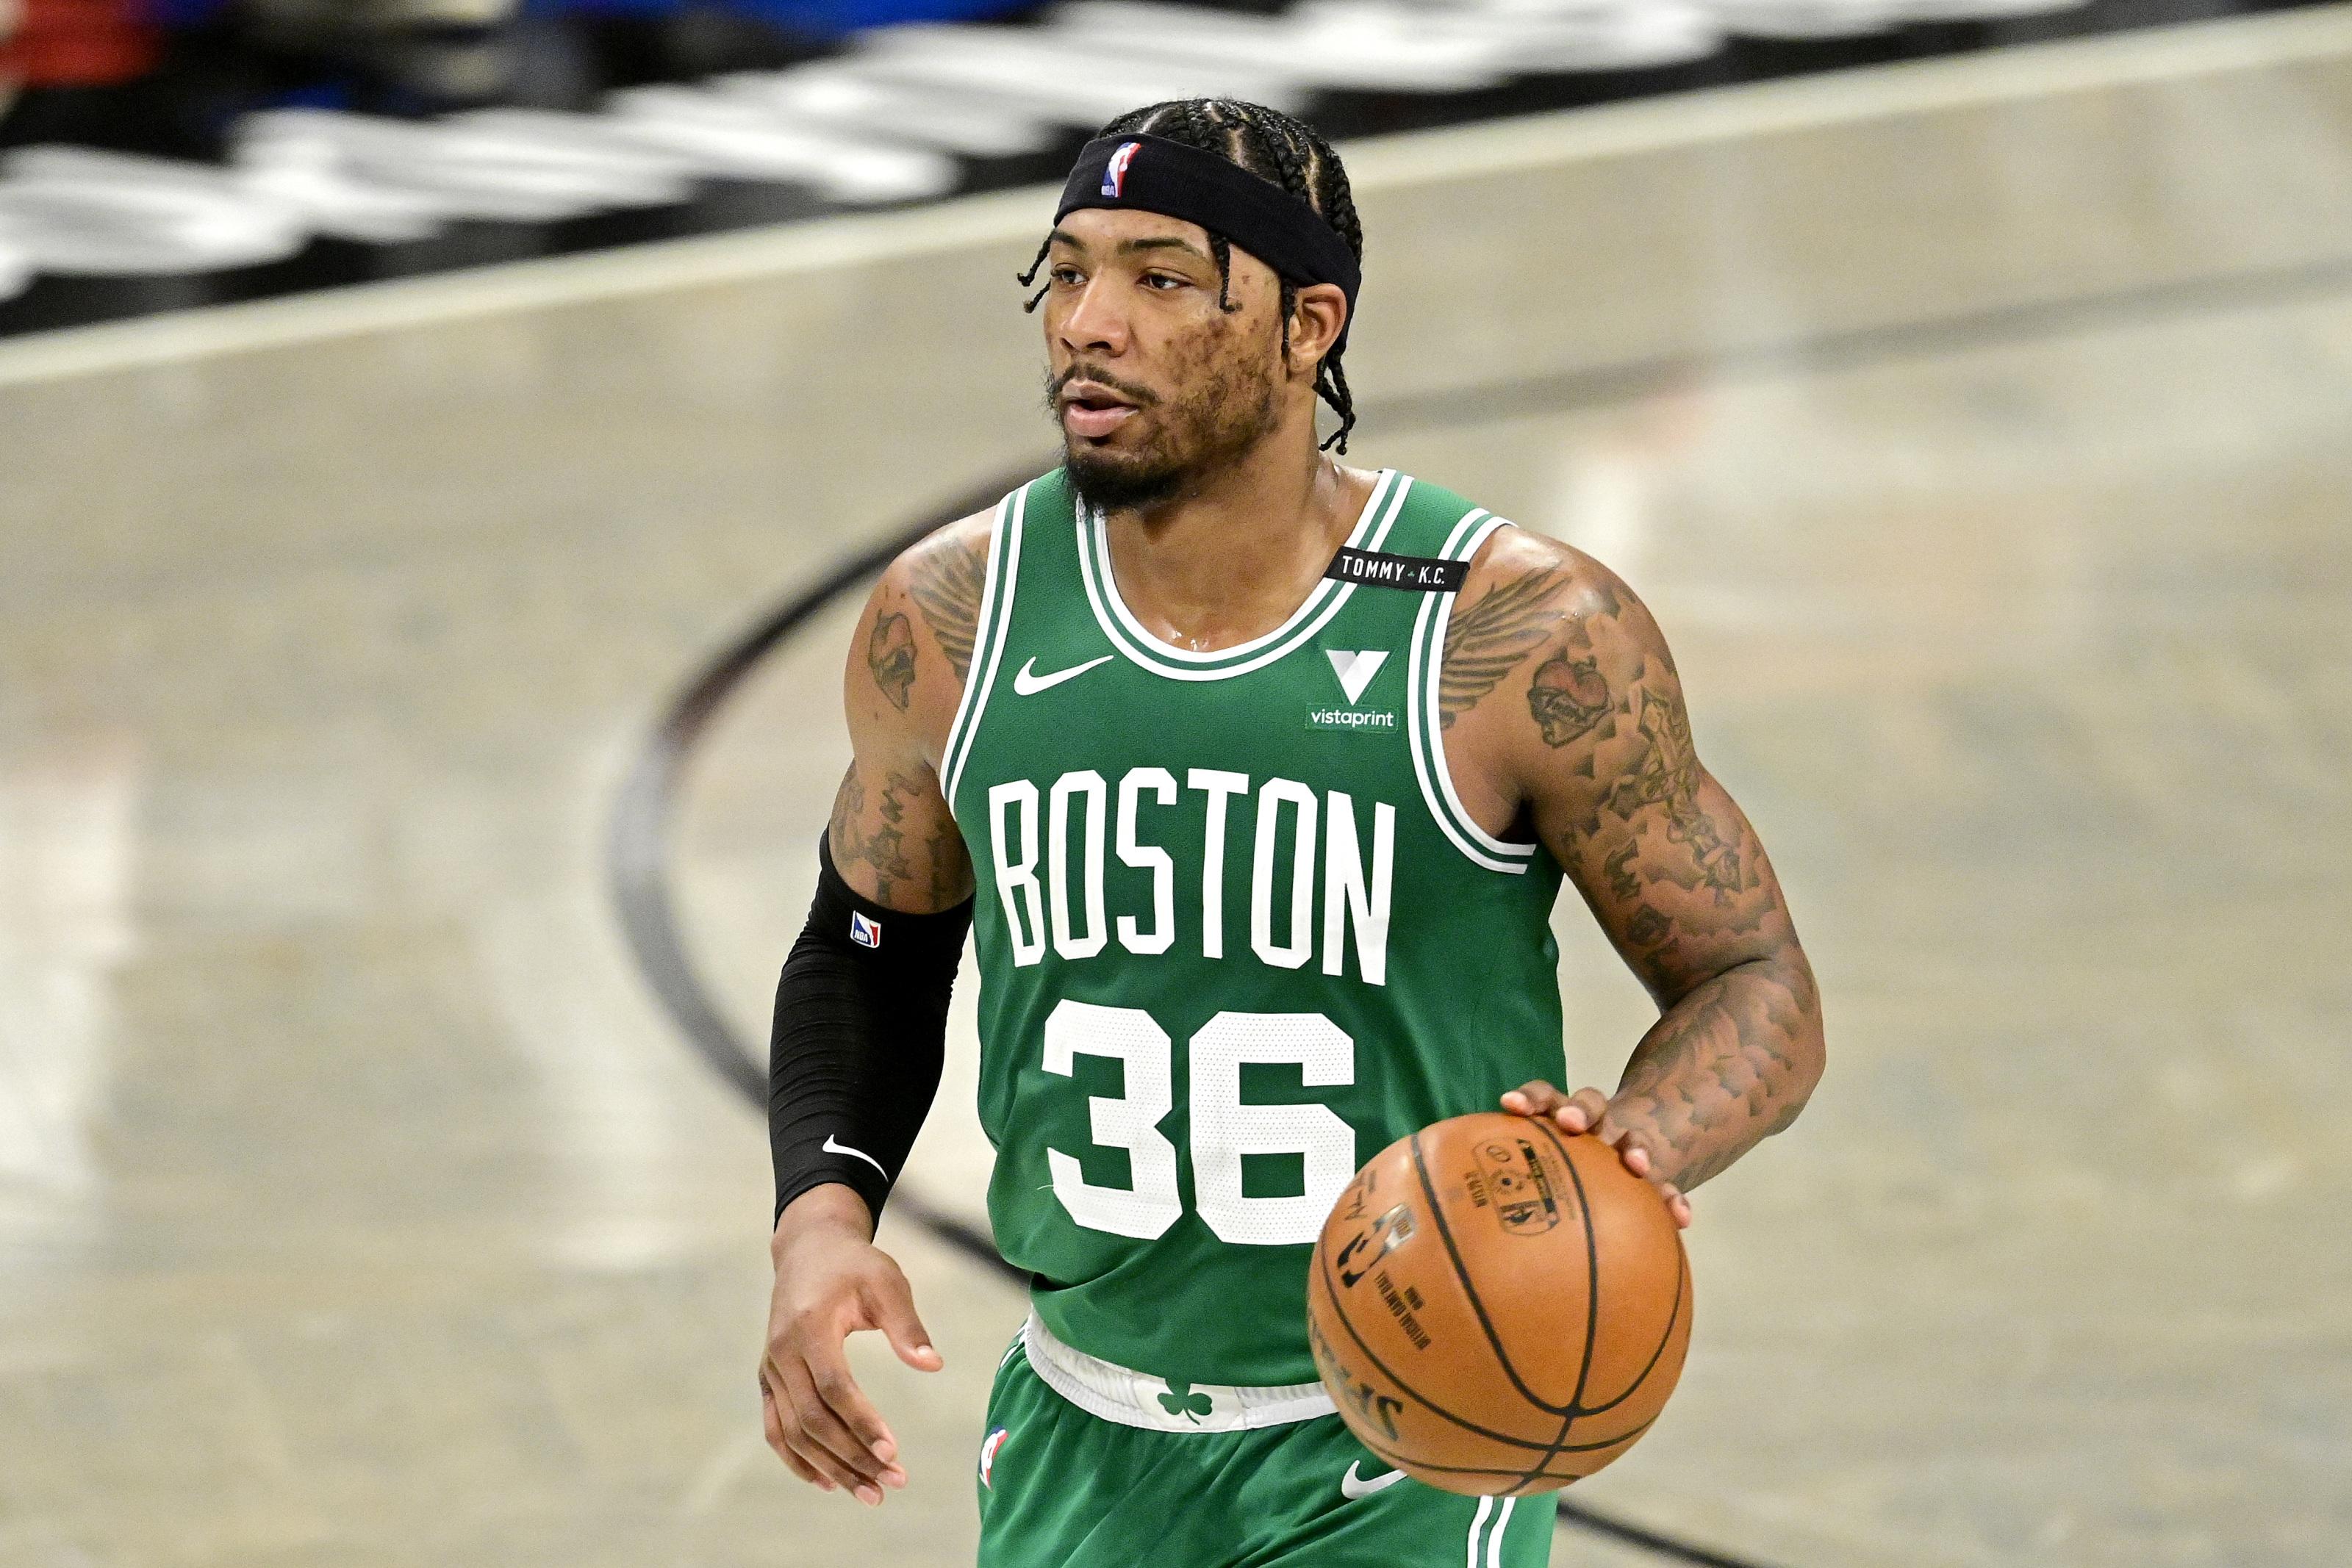 Boston Celtics: Marcus Smart ranked as best trade asset for Cs